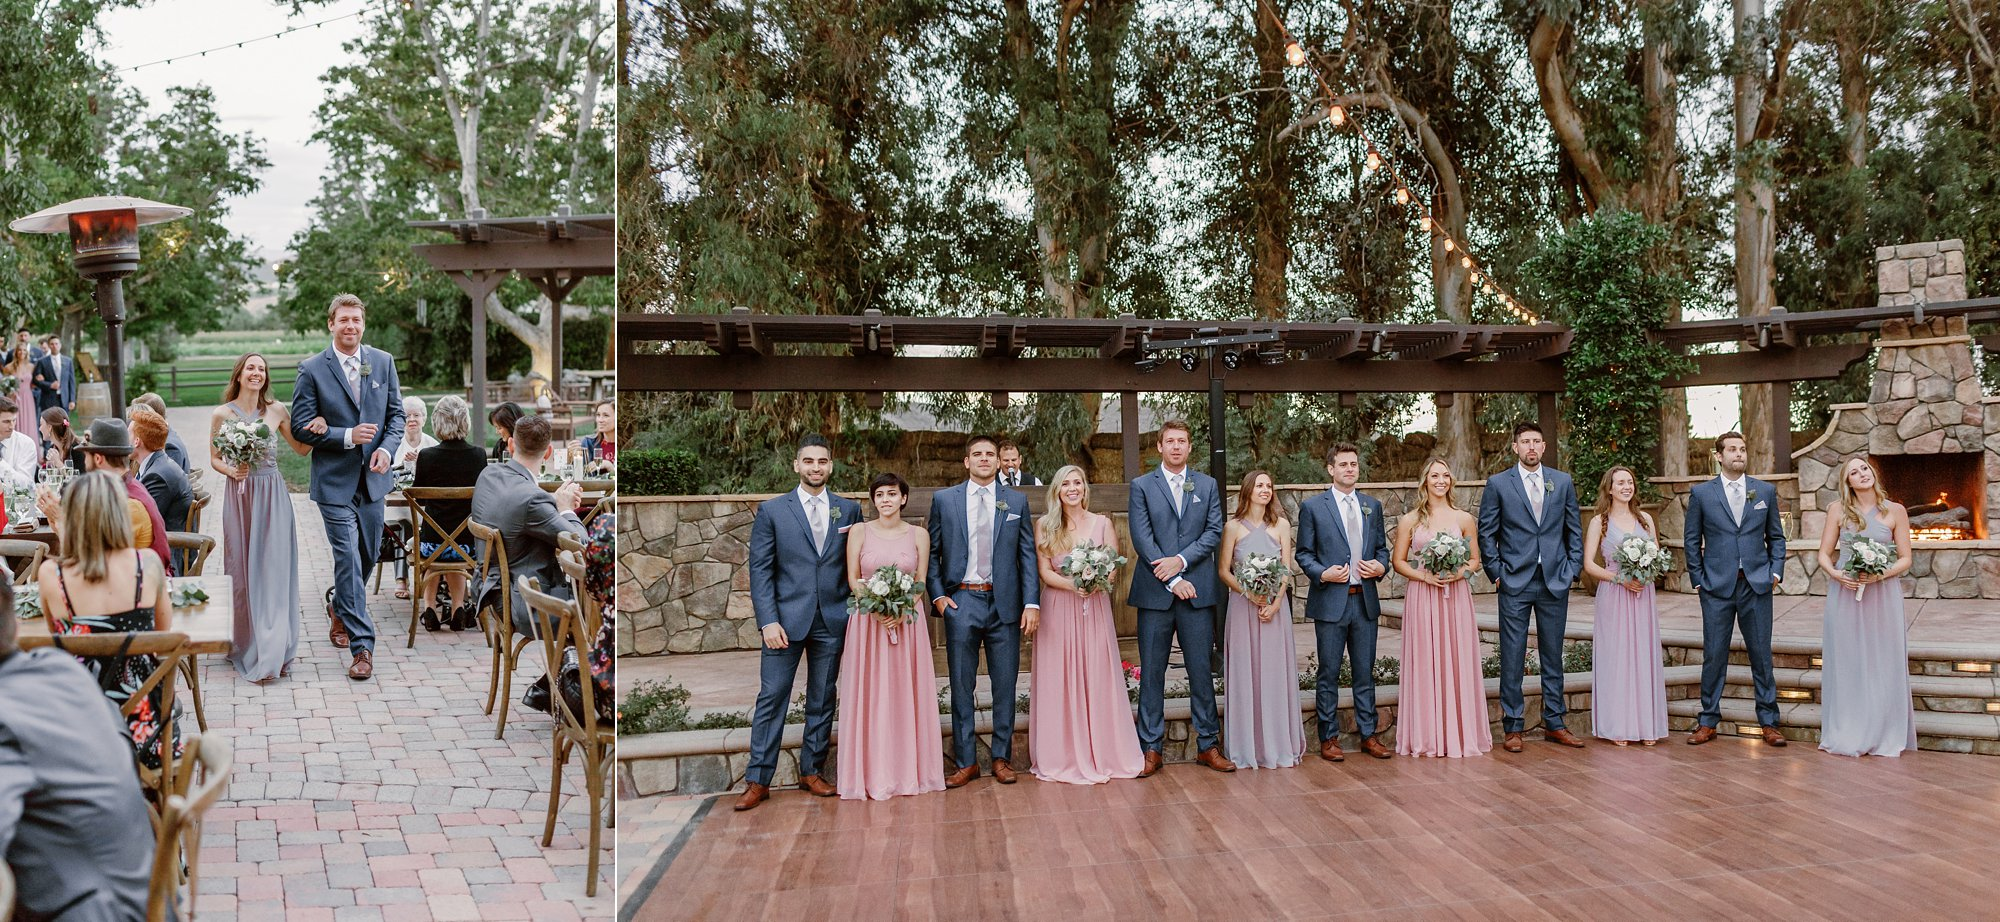 Walnut Grove Moorpark California Wedding_0075.jpg